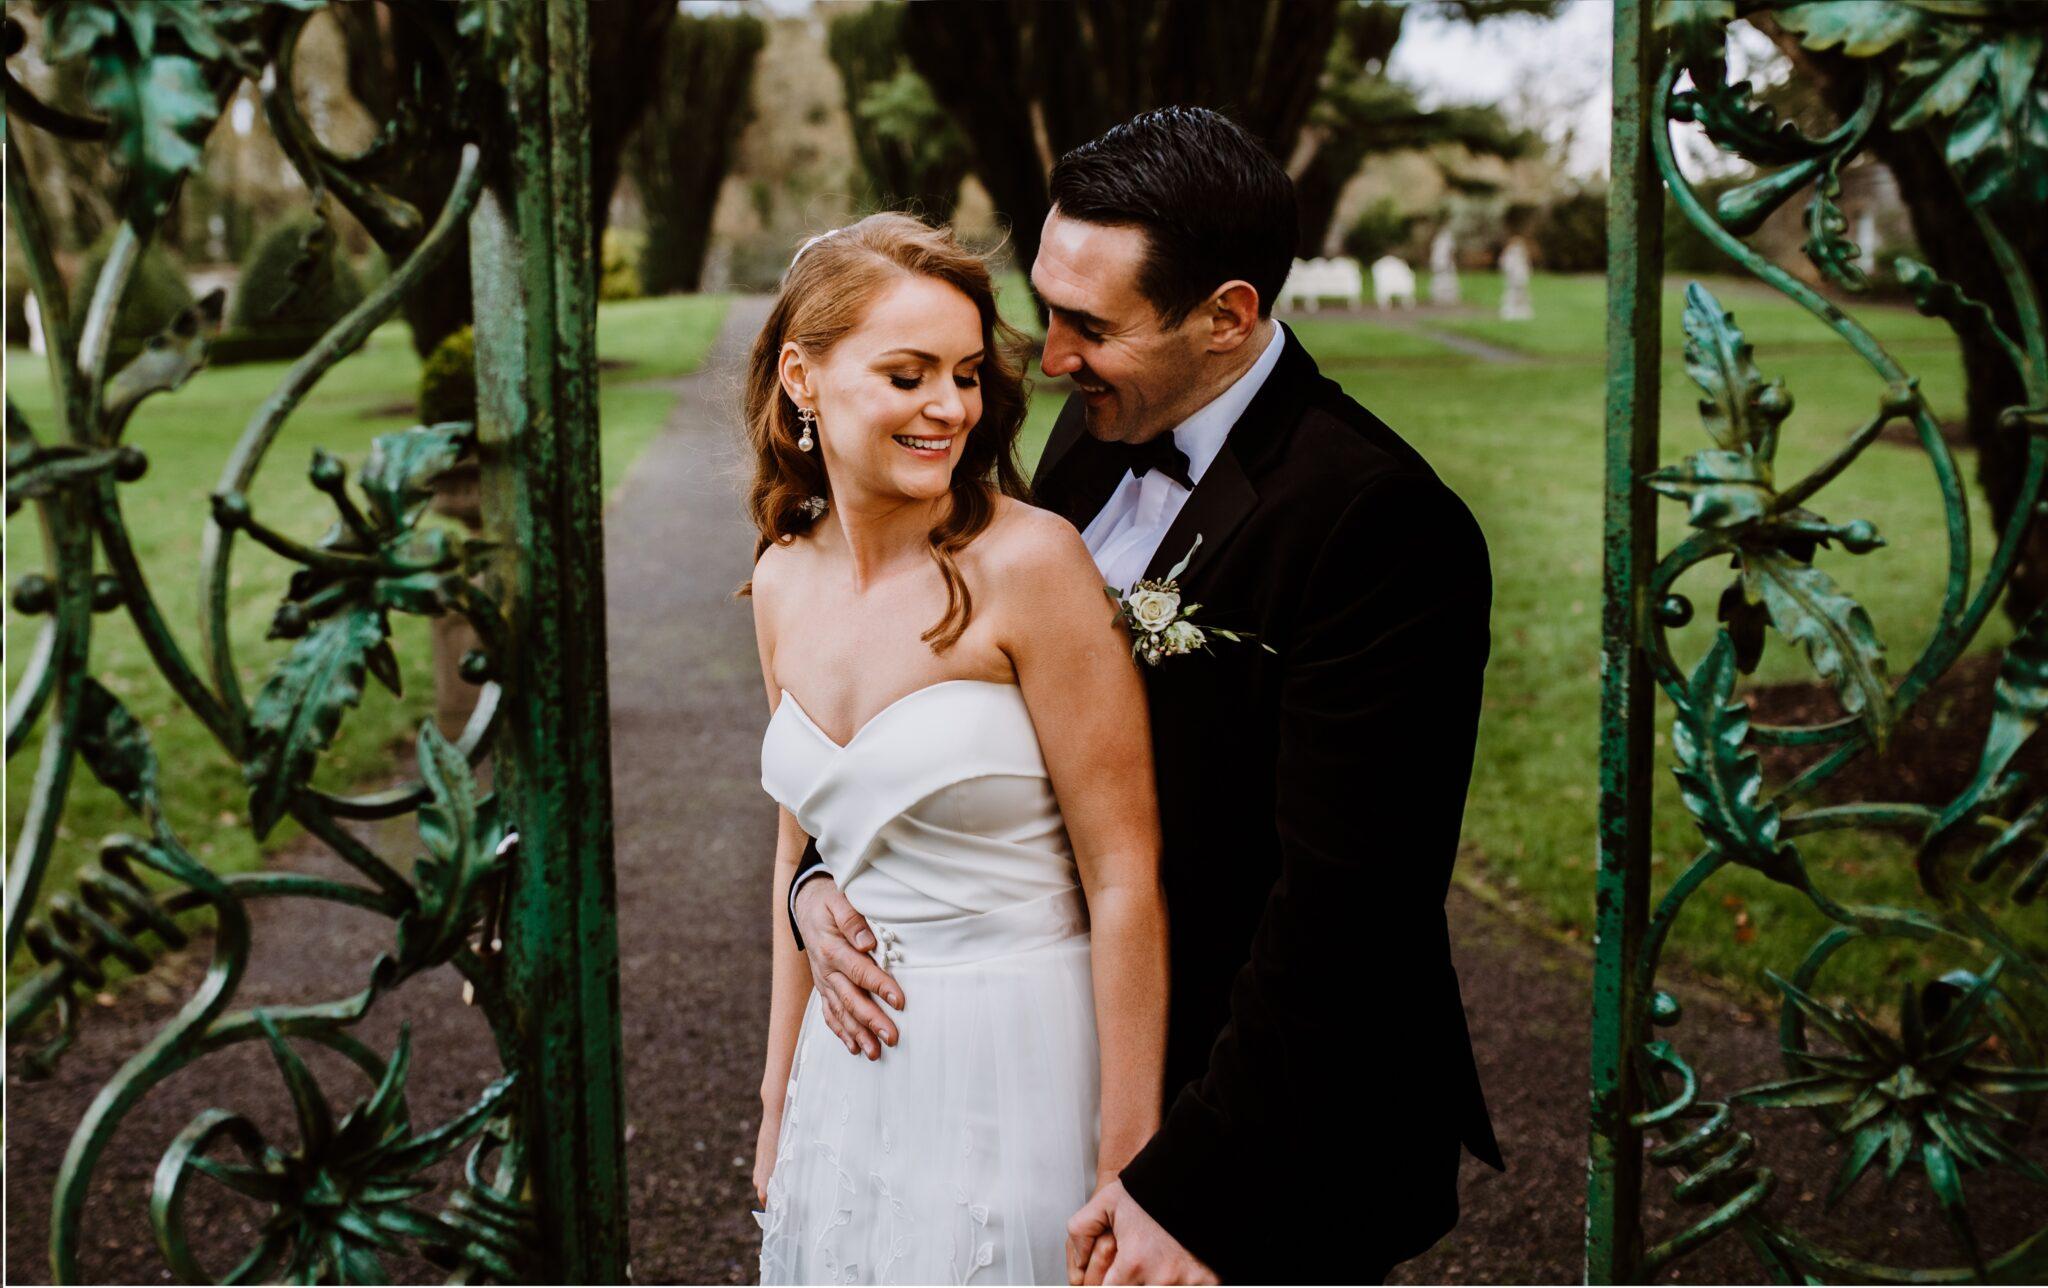 Tankardstown Wedding Photographer. Top Wedding Photographer in Ireland. Best Co Meath wedding photographer